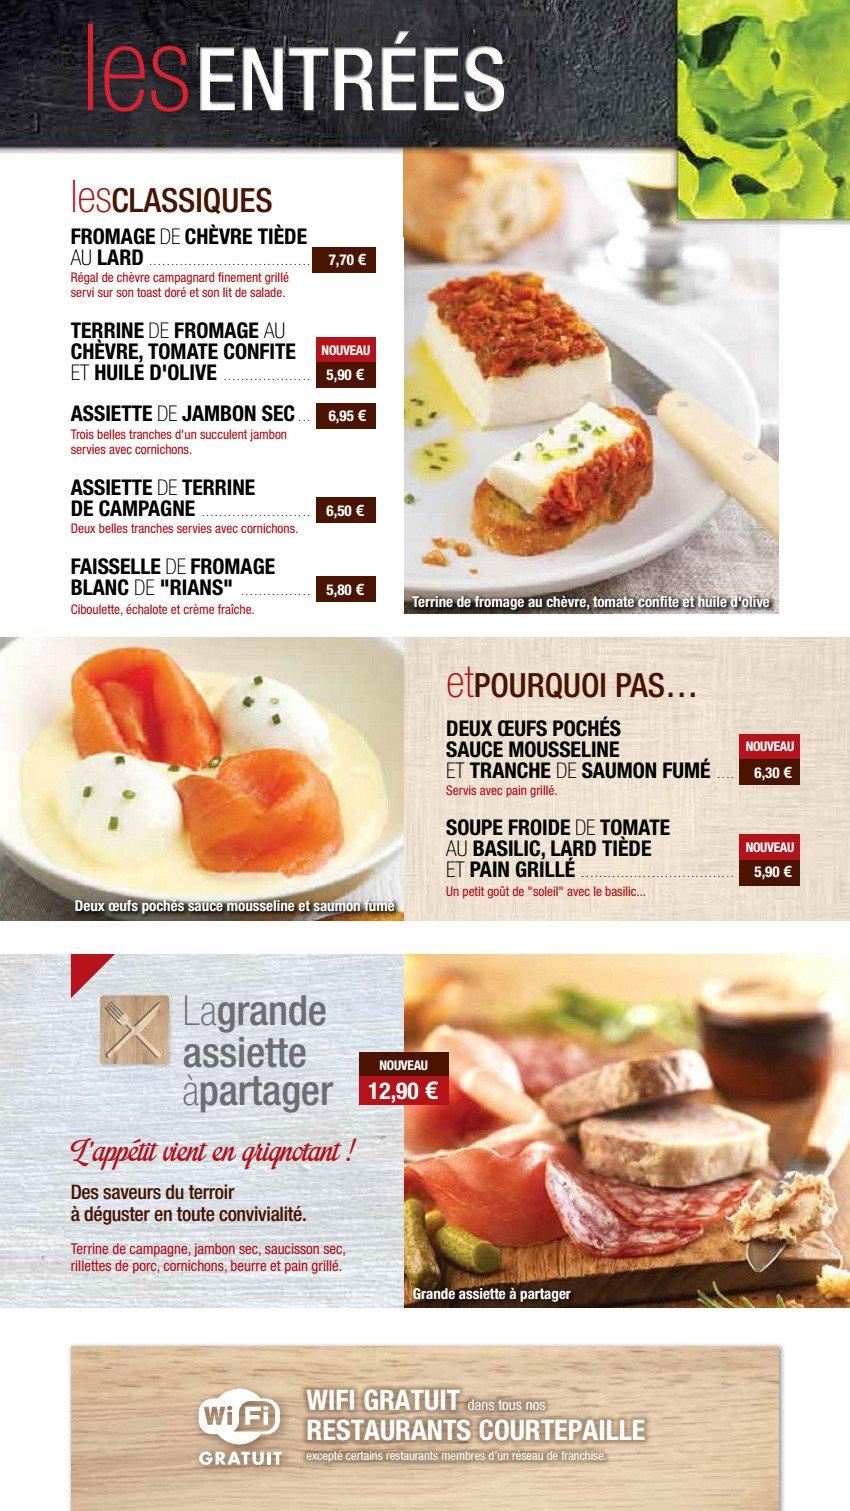 Courtepaille pontault combault carte et menu en ligne - Buffalo grill pontault combault ...